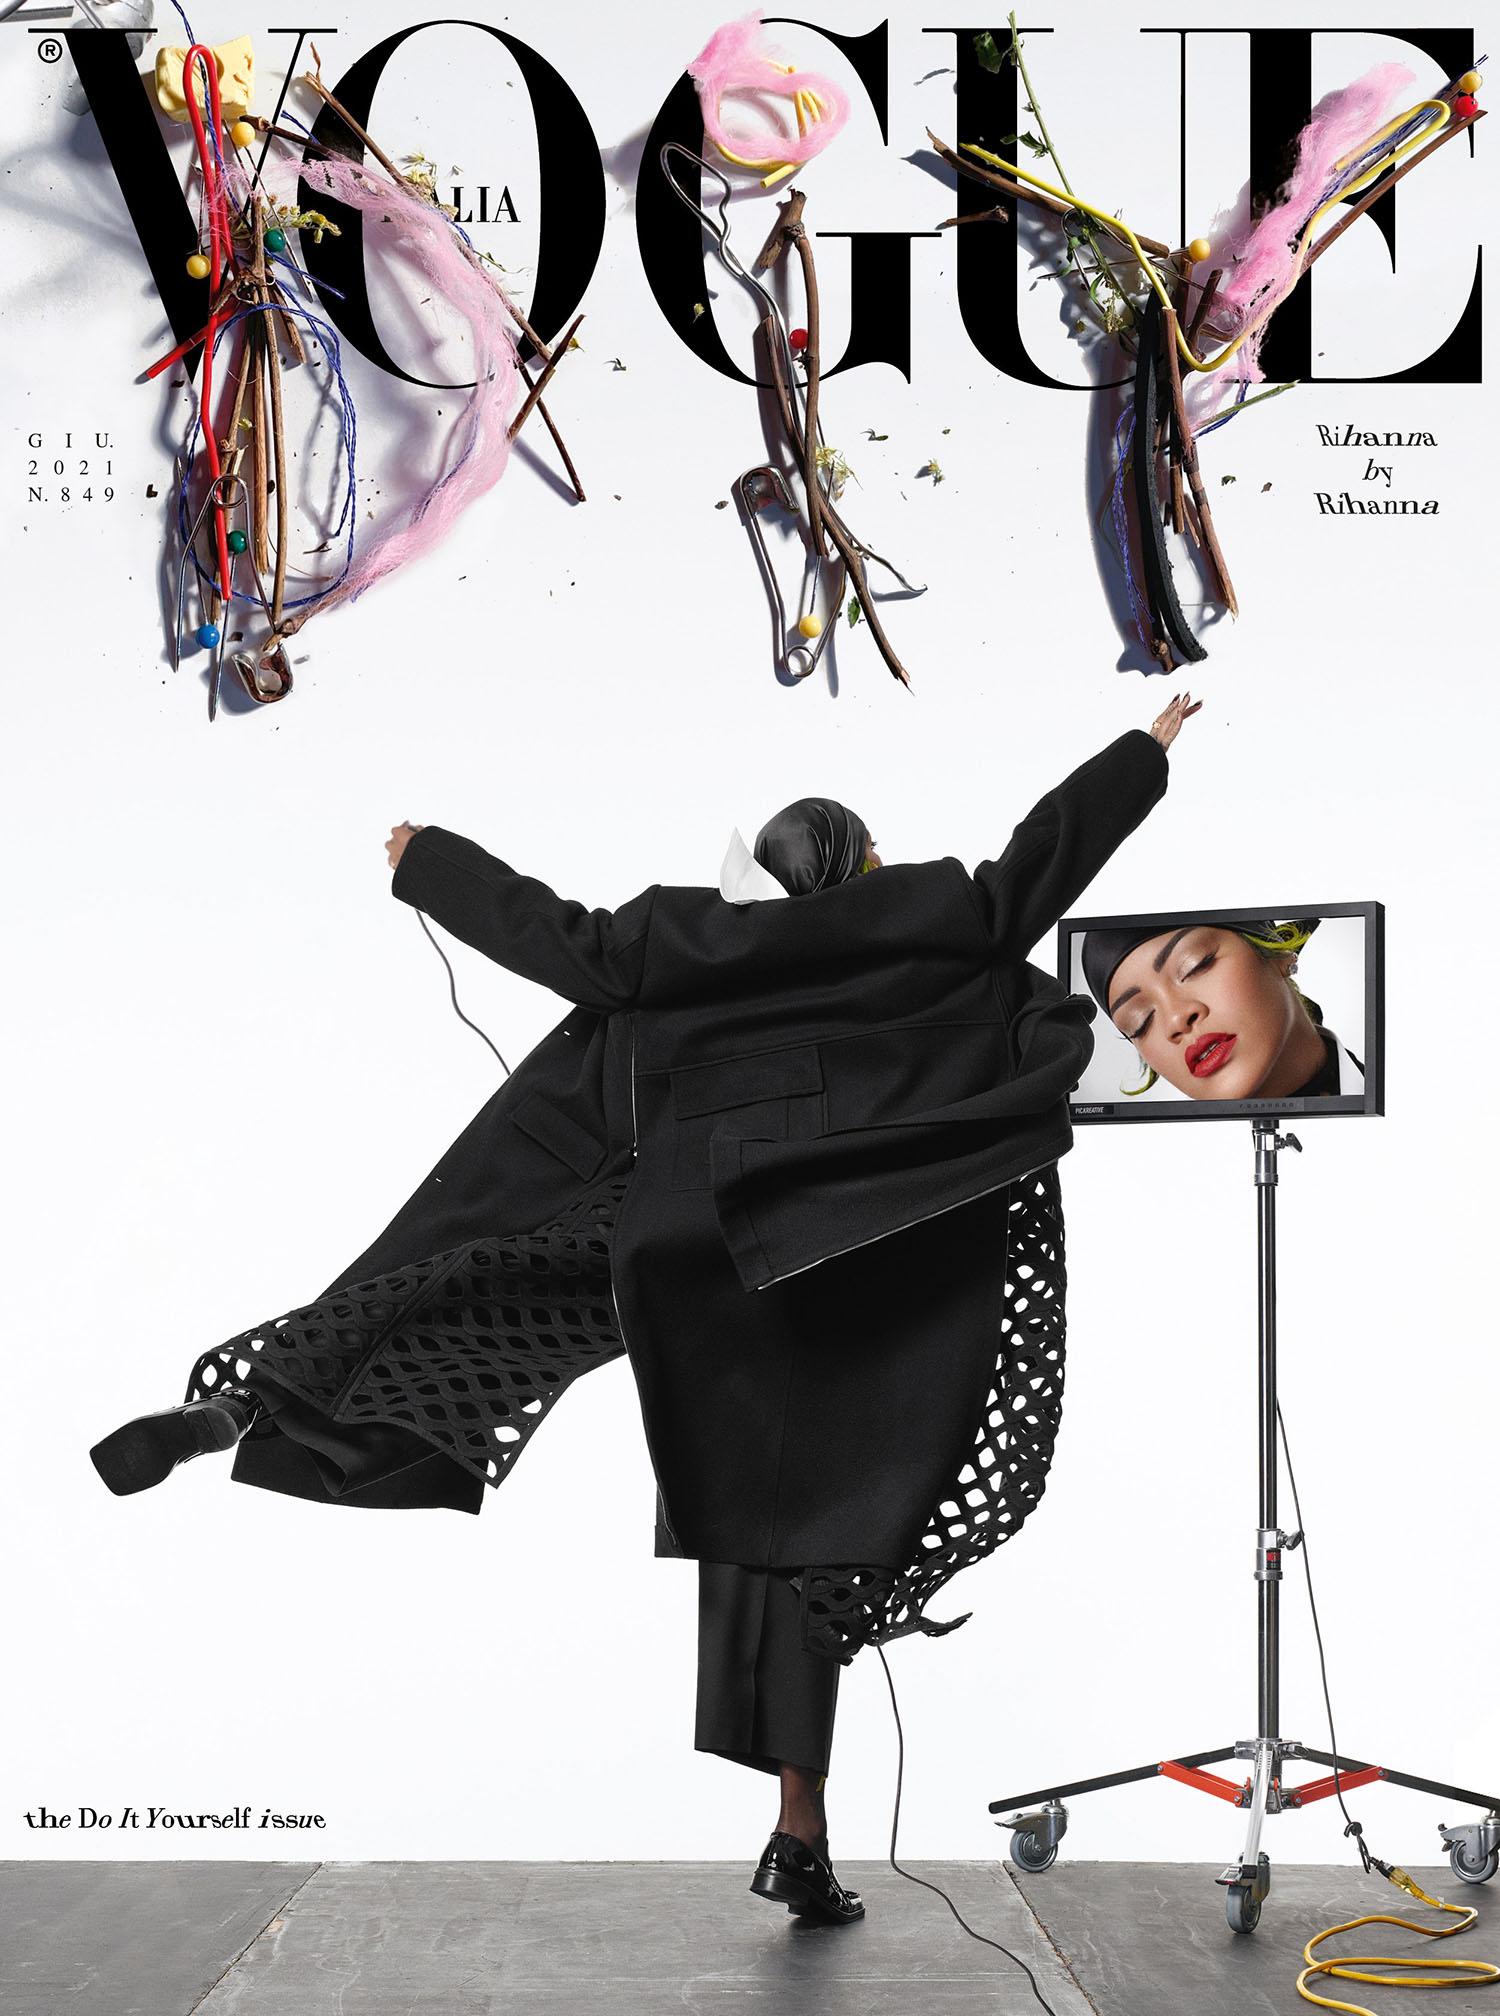 Rihanna covers Vogue Italia June 2021 by Rihanna